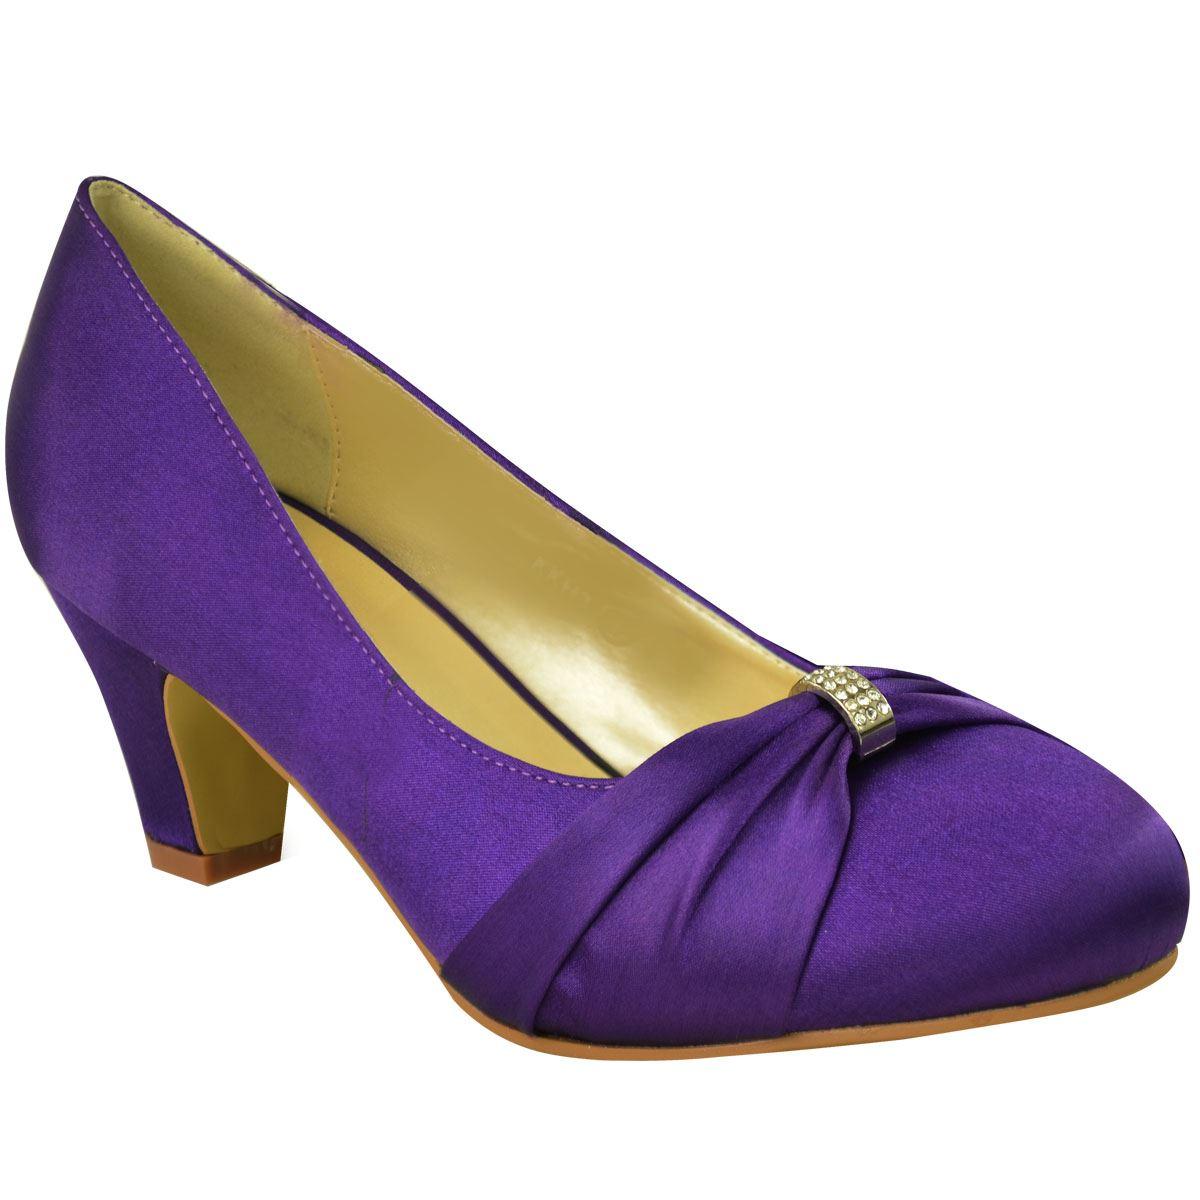 0ae88d0cd85 Womens Wedding Bridal Ladies Prom Shoes Low Heel Bridesmaid Evening ...